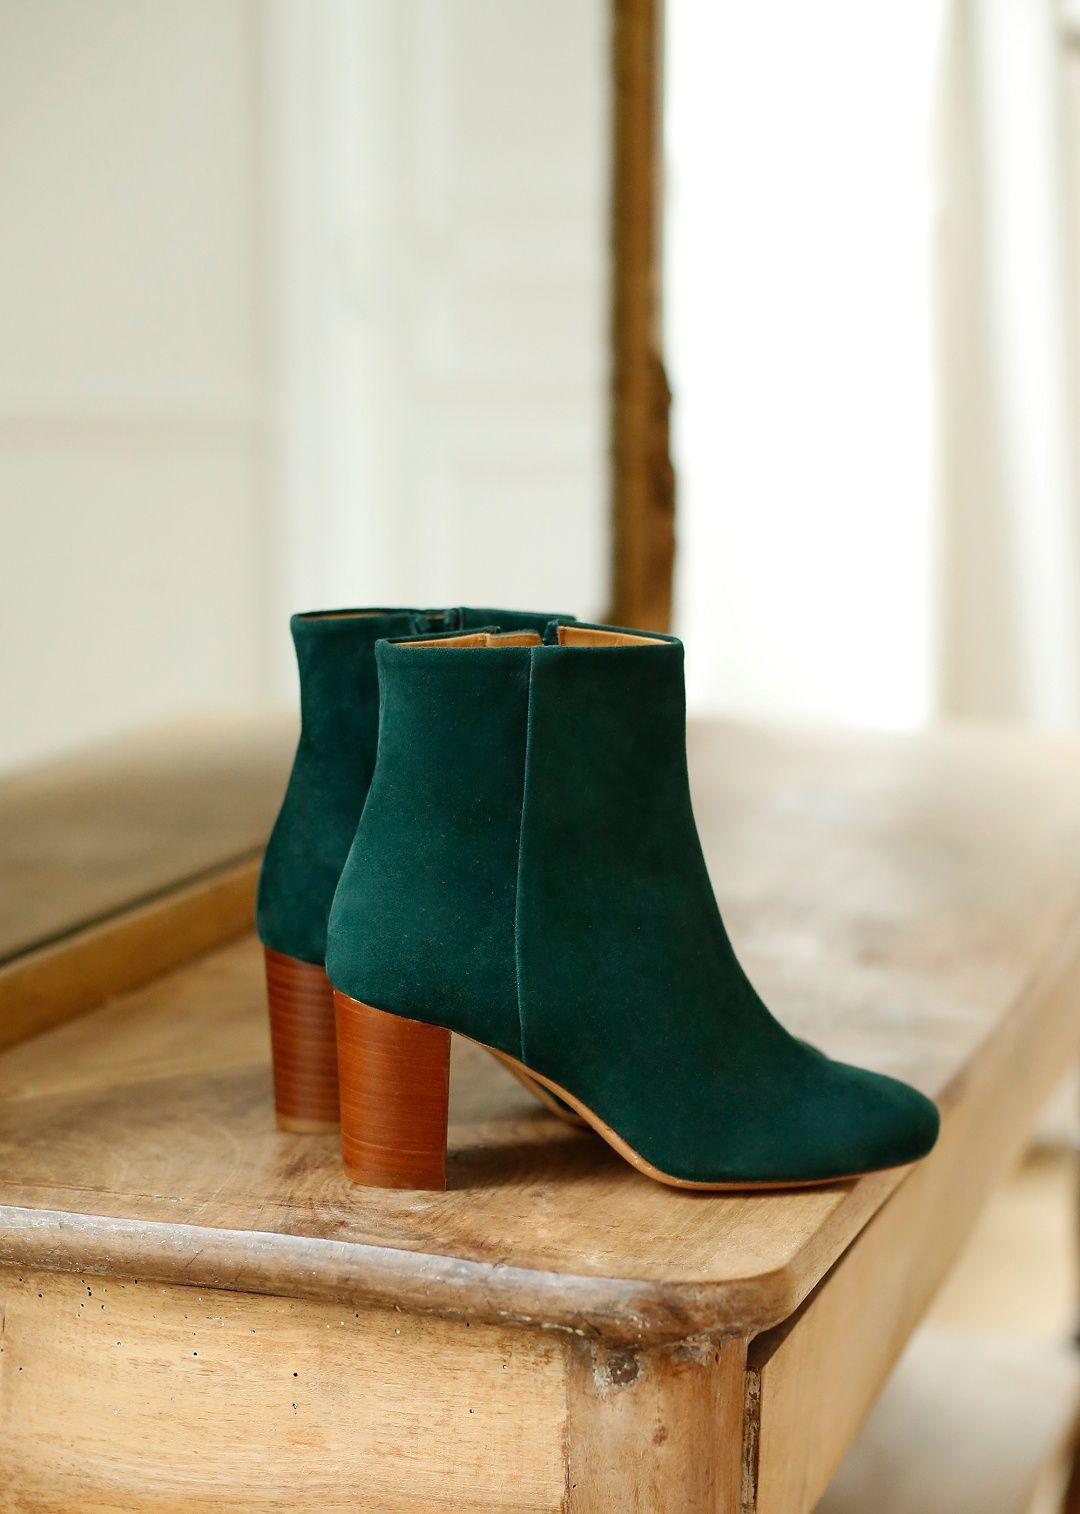 b66c4838c5a2 Sézane - Léa Boots | fashion in 2019 | Shoes, Boots, Fashion